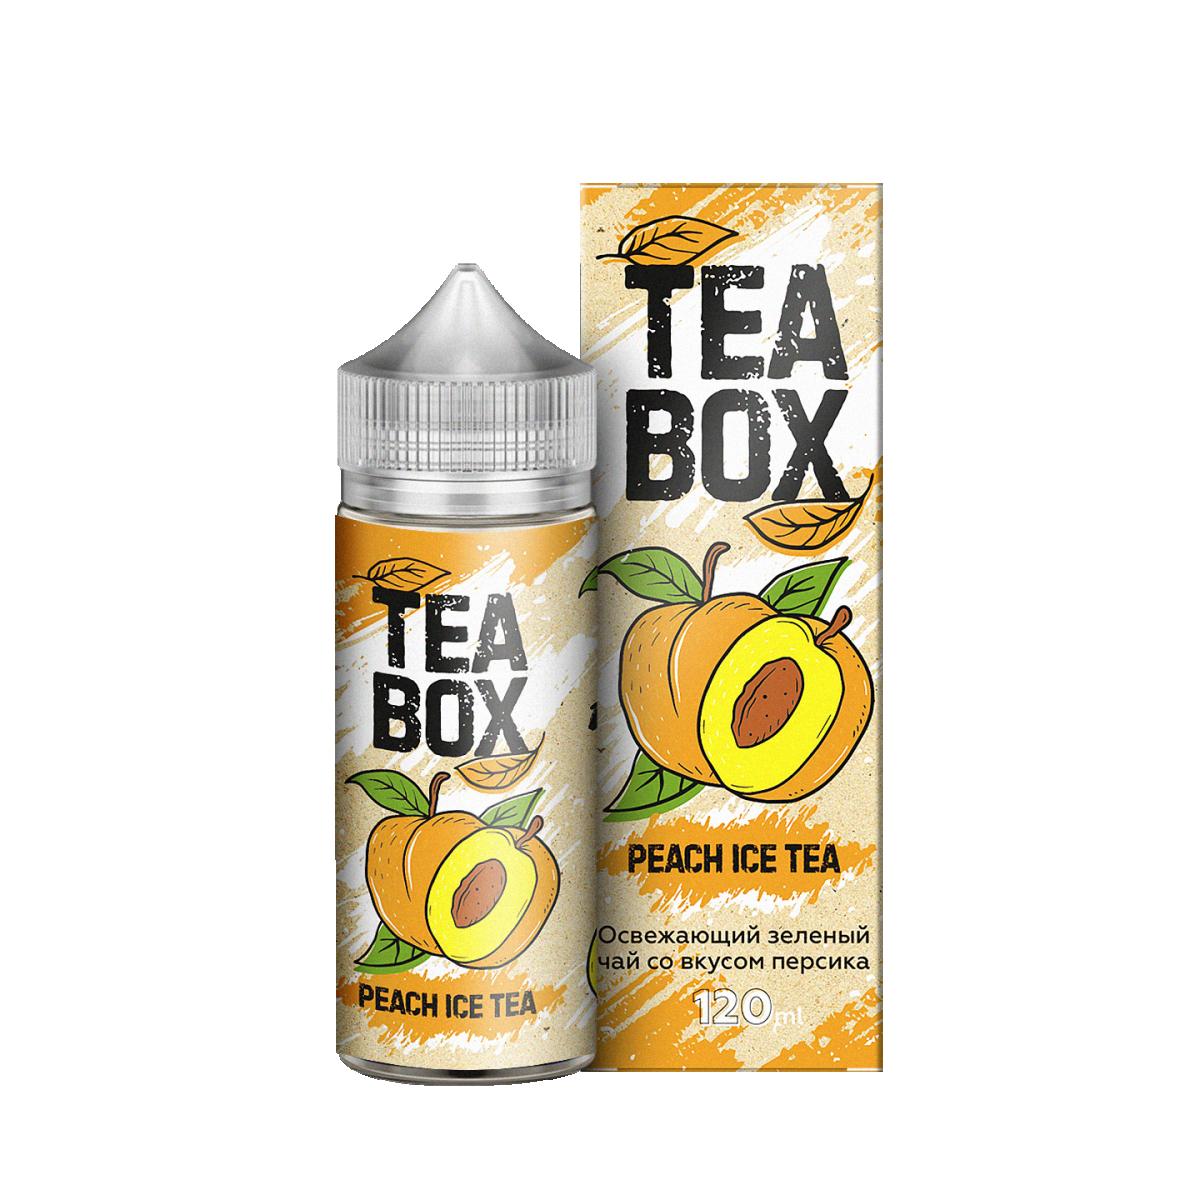 TEA BOX: MANGO PINEAPPLE 120ML 3MG